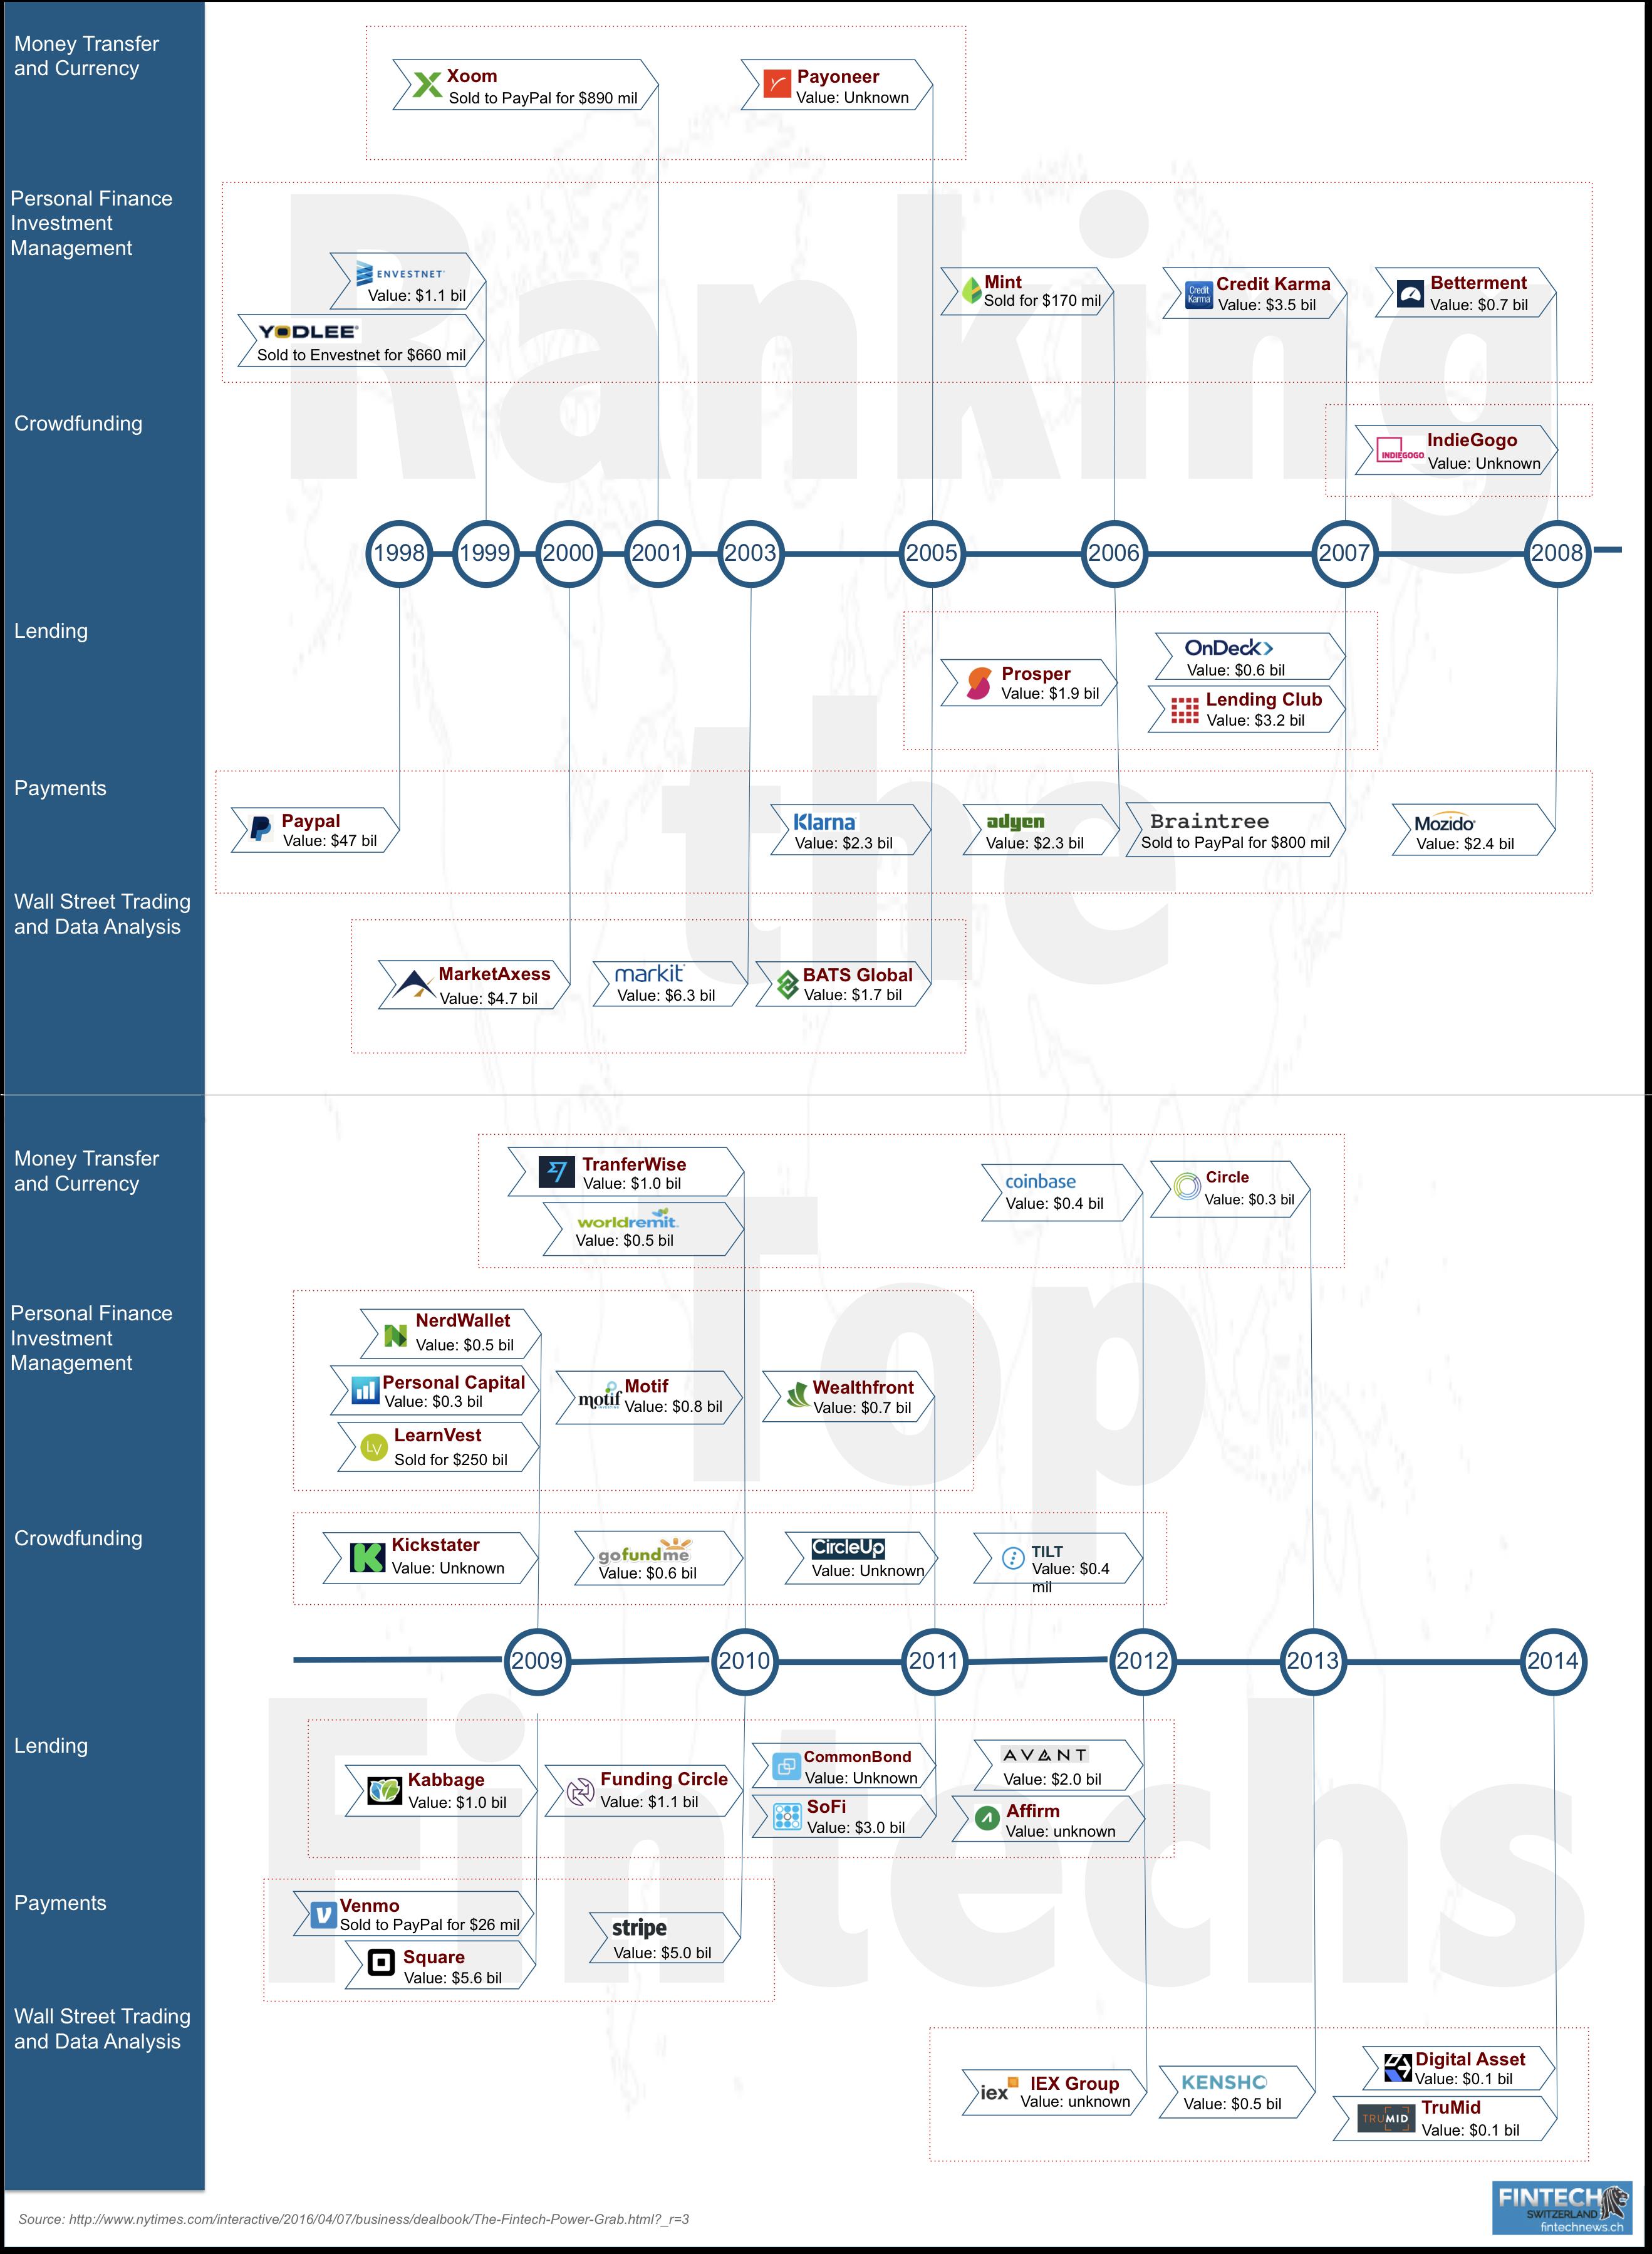 Ranking The Top Fintech Companies